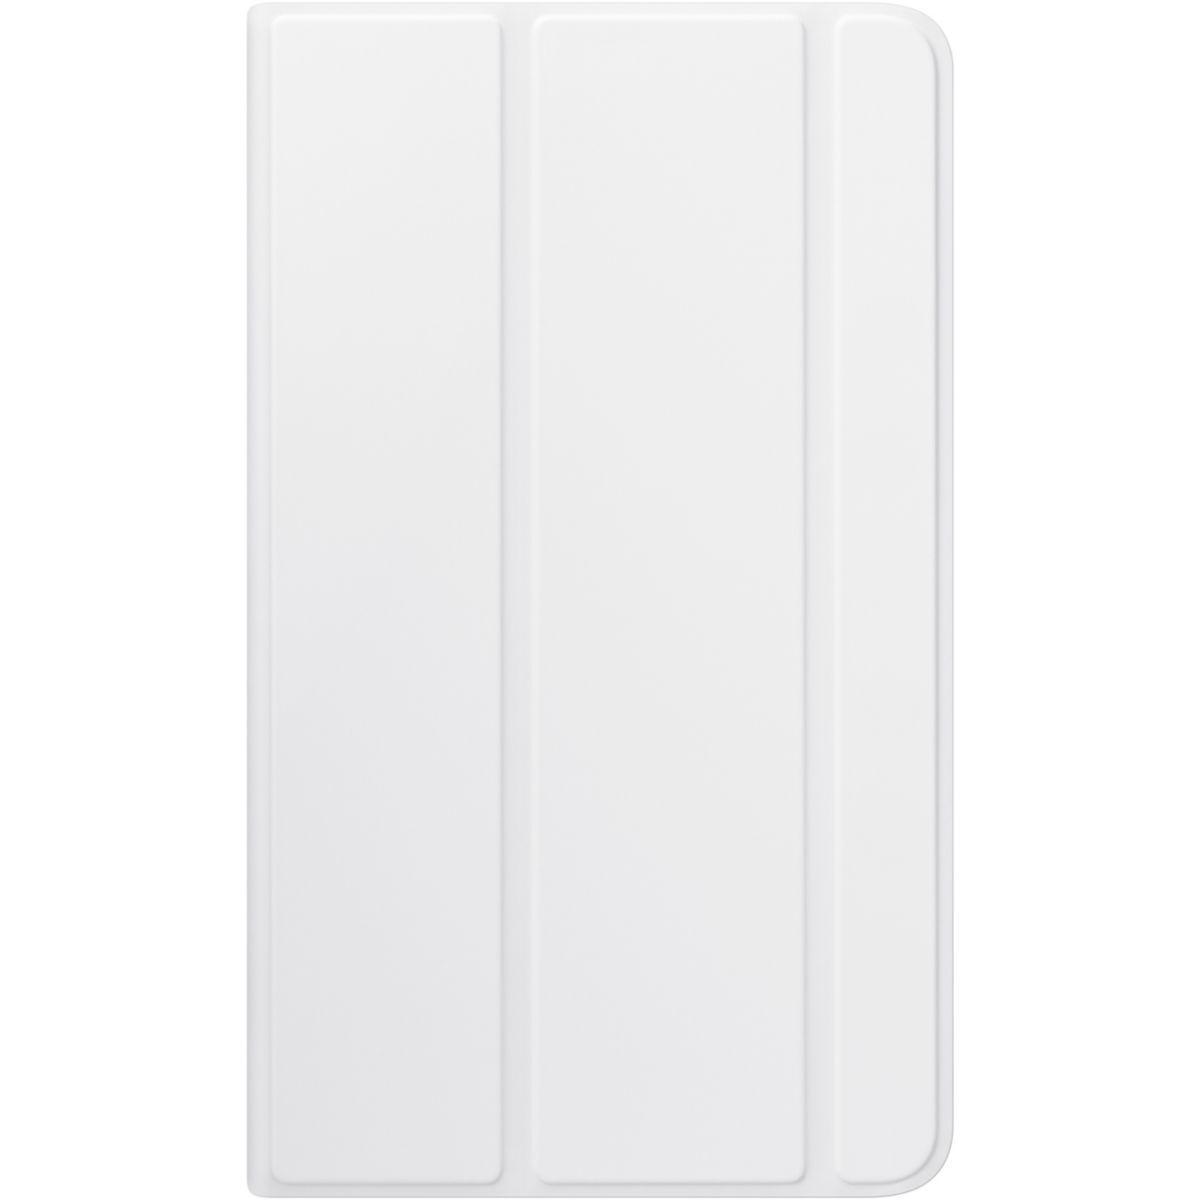 Etui tablette samsung book cover tab a 6 7'' blanc - livraison offerte : code premium (photo)